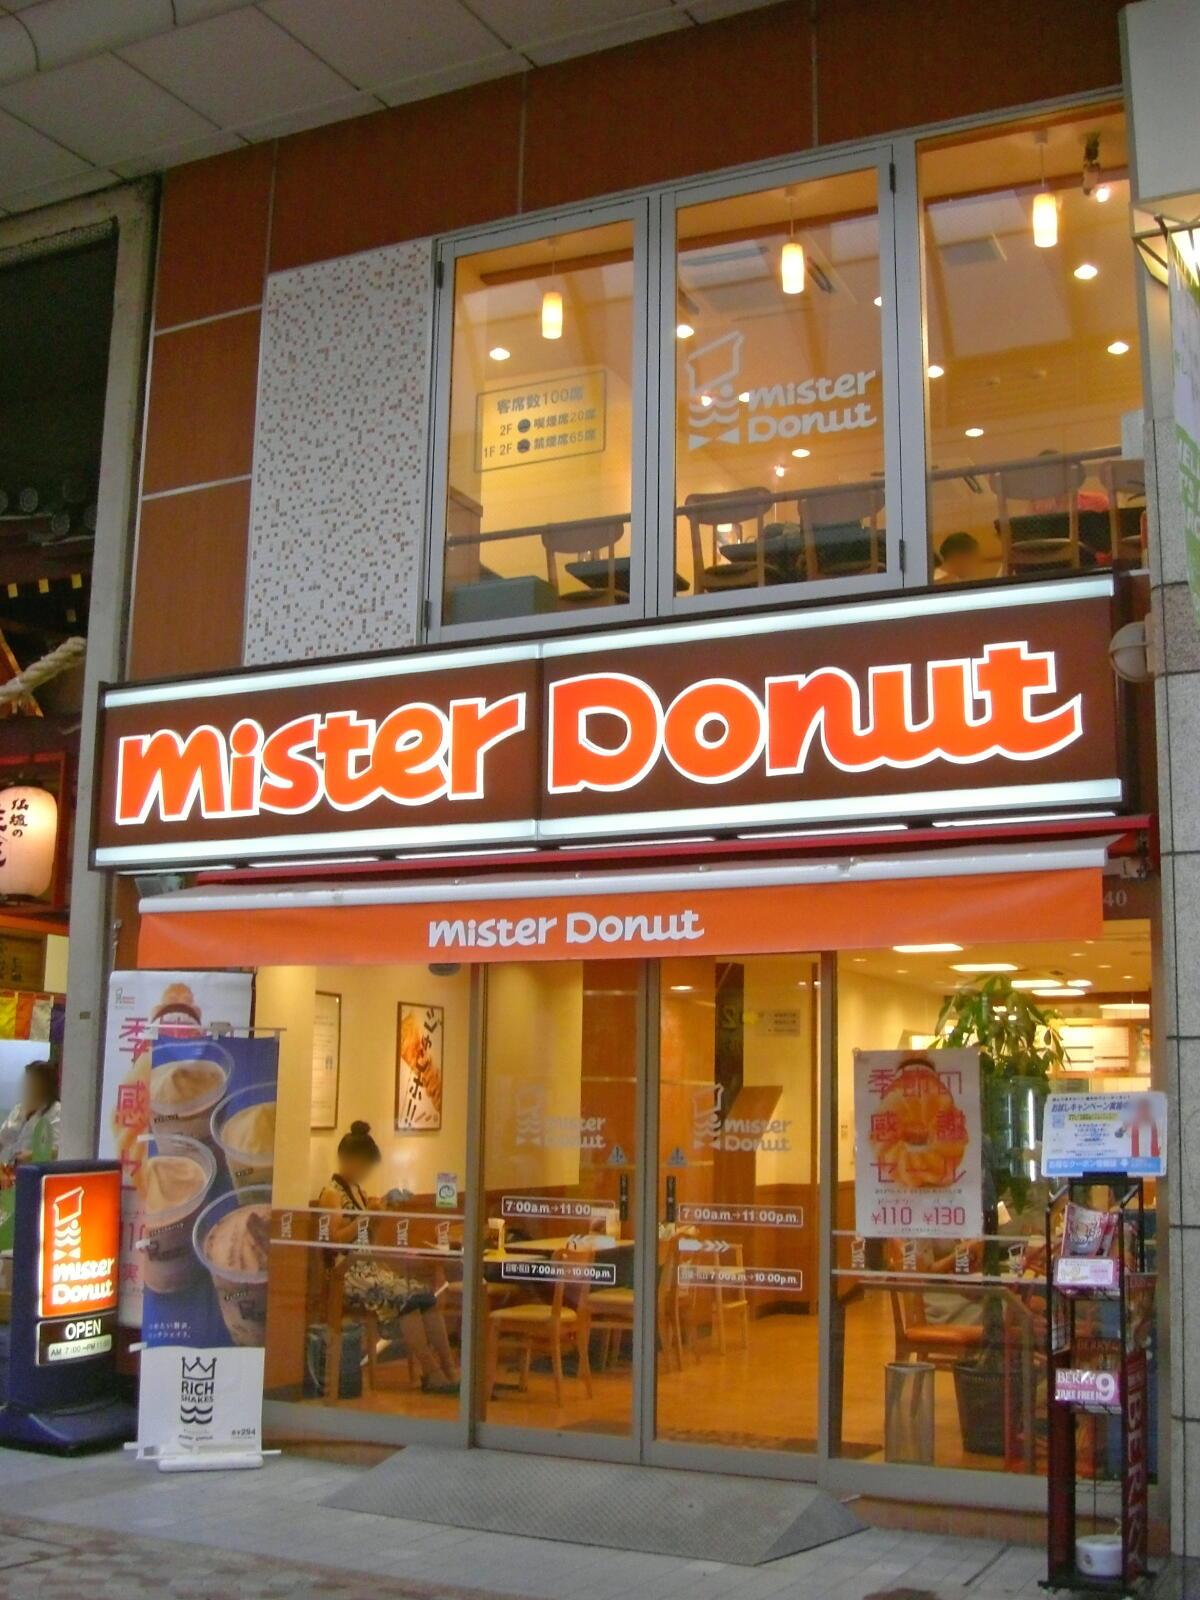 Mister Donut Wikiwand - Dunkin donuts location map usa